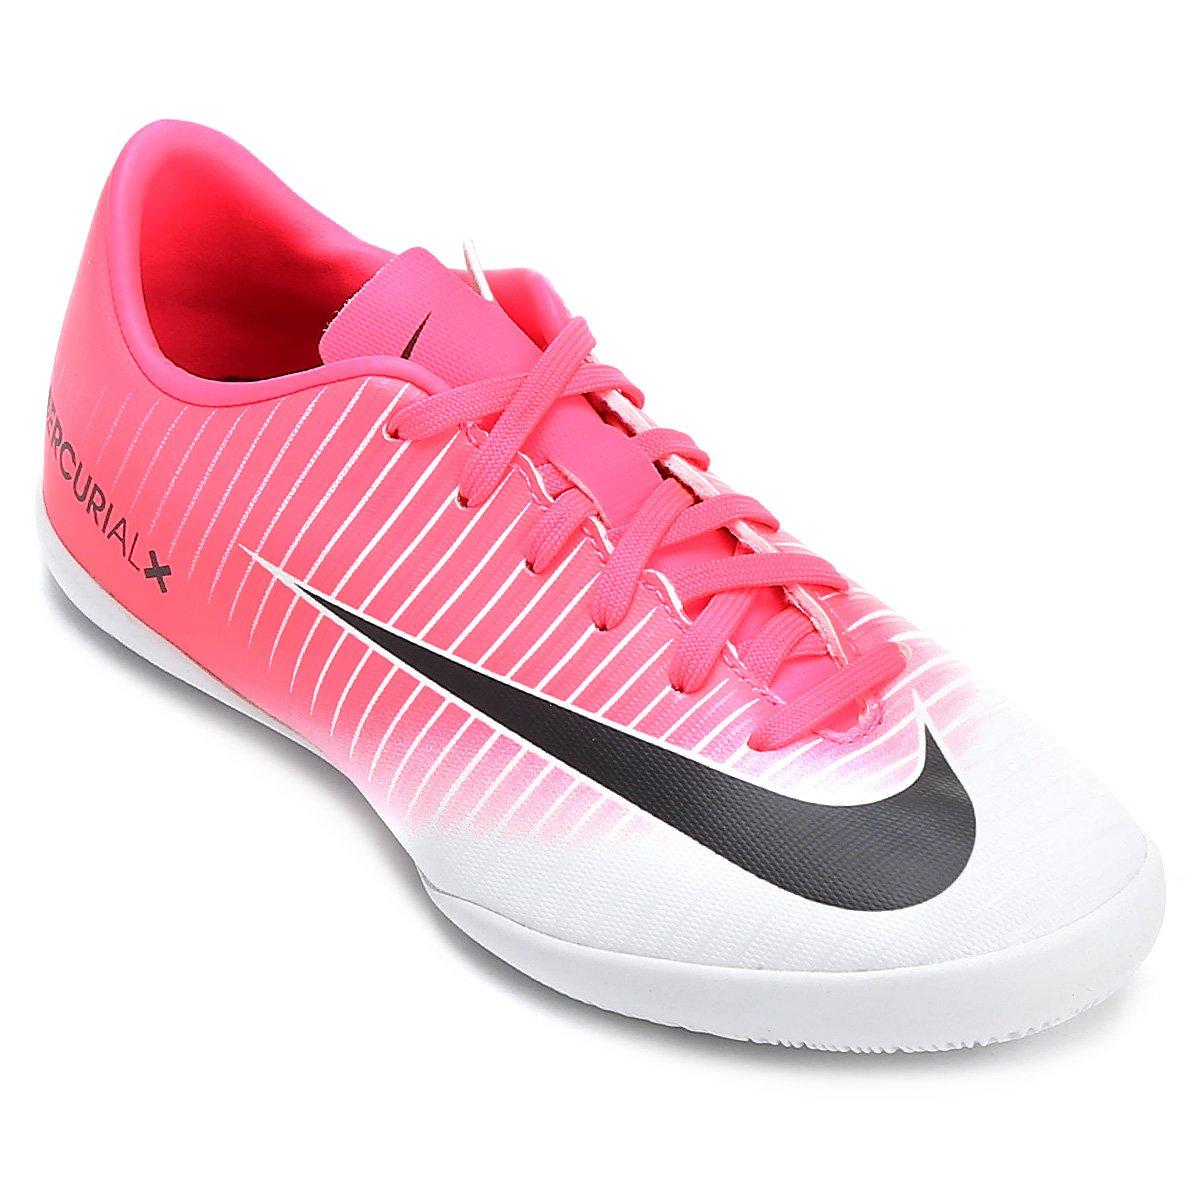 9e6b209a56 Chuteira Futsal Infantil Nike Mercurial Vapor XI IC - Compre Agora ...